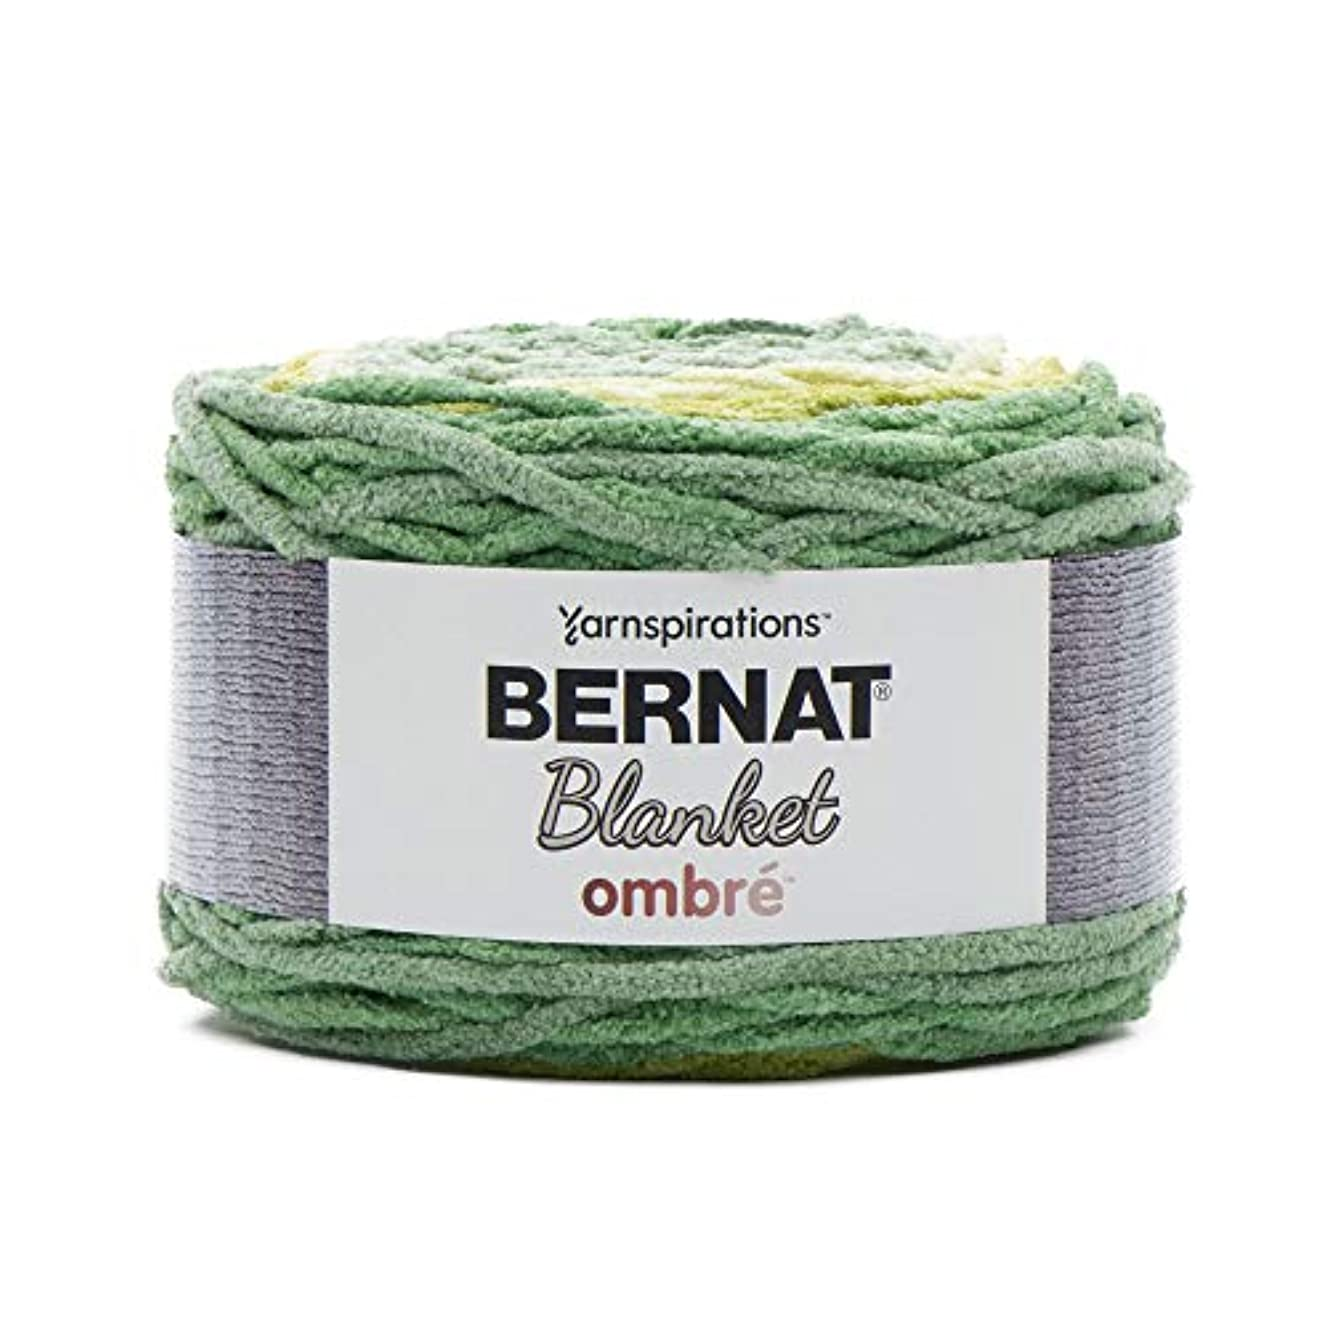 Bernat 16103636012 Blanket Ombre Yarn, Spring Green